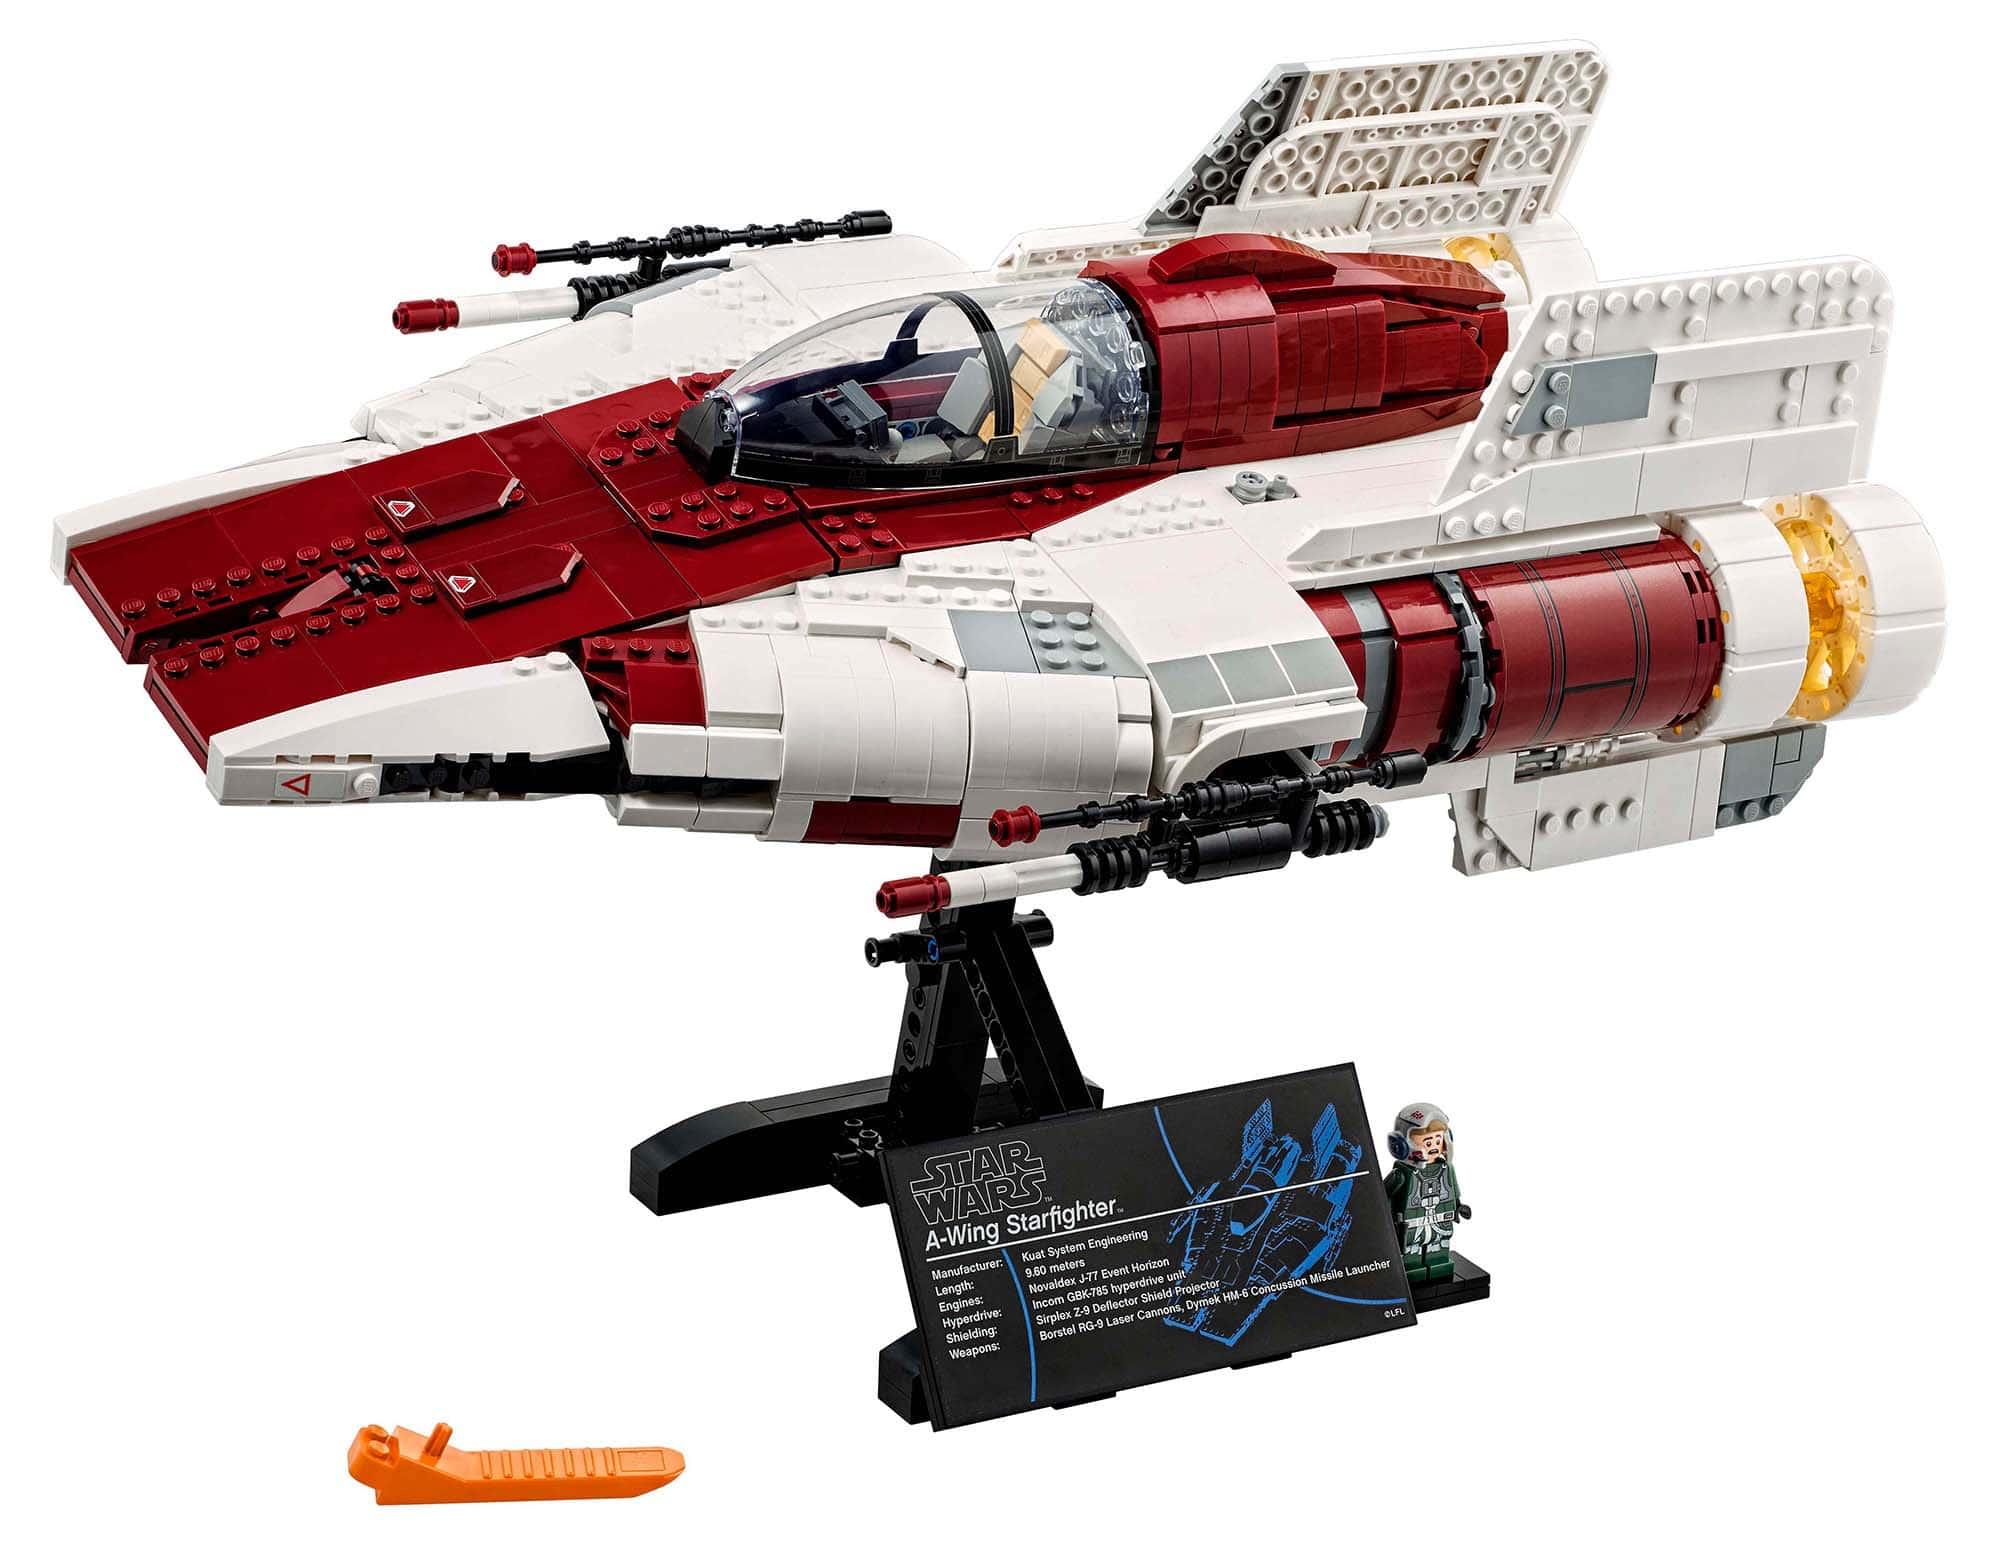 LEGO Star Wars 75275 UCS A-Wing Starfighter